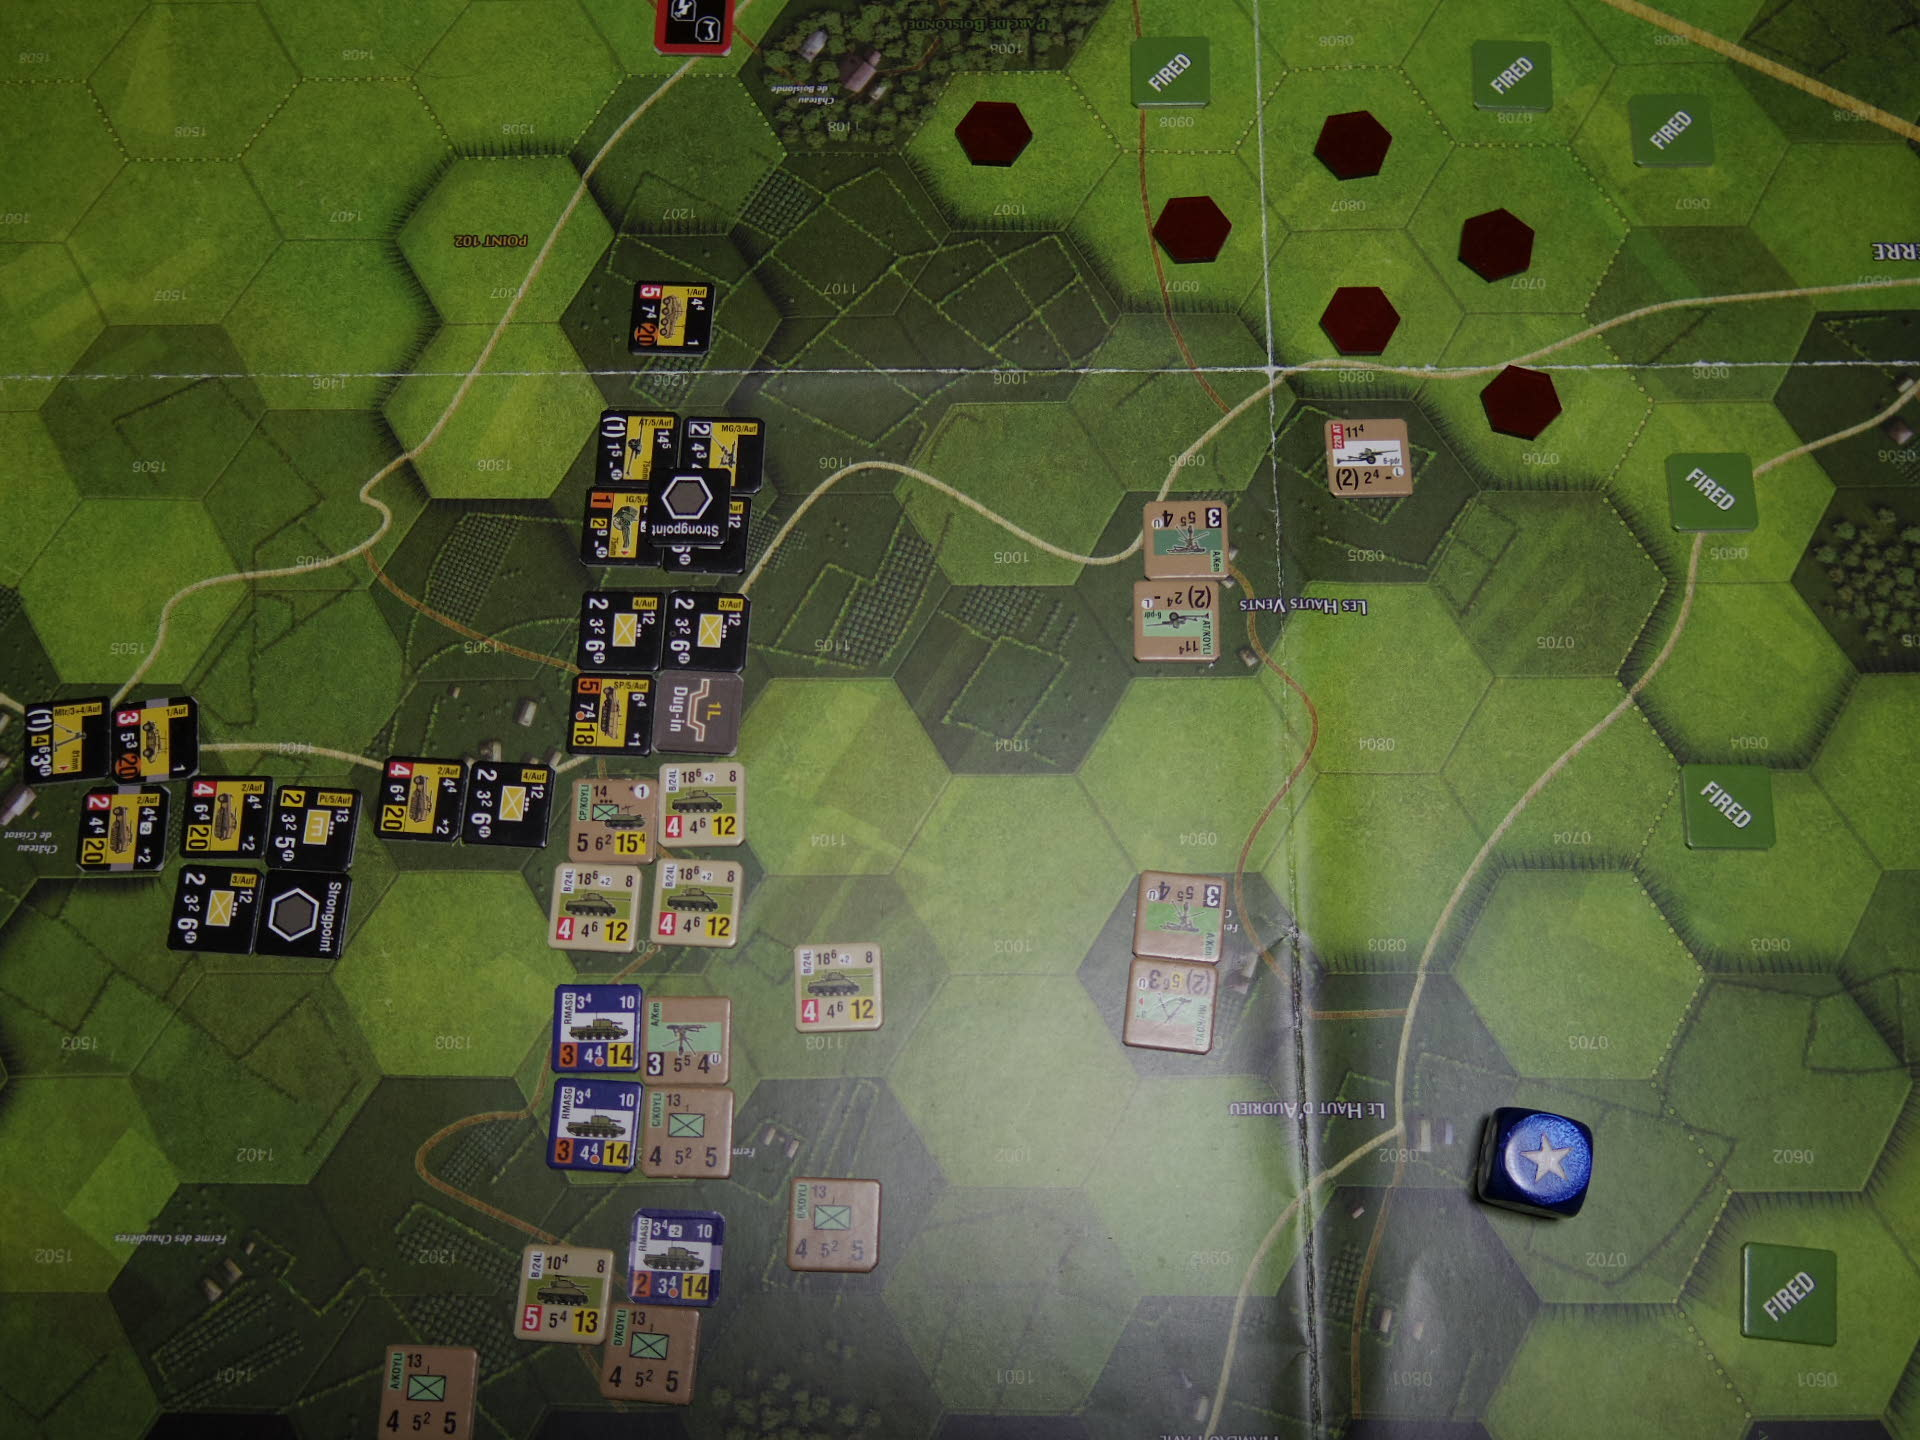 (GMT)Operation Dauntlessシナリオ18.1「Nightmarish Crossroad(悪夢の如き交差路)」その㈡_b0173672_01311212.jpg